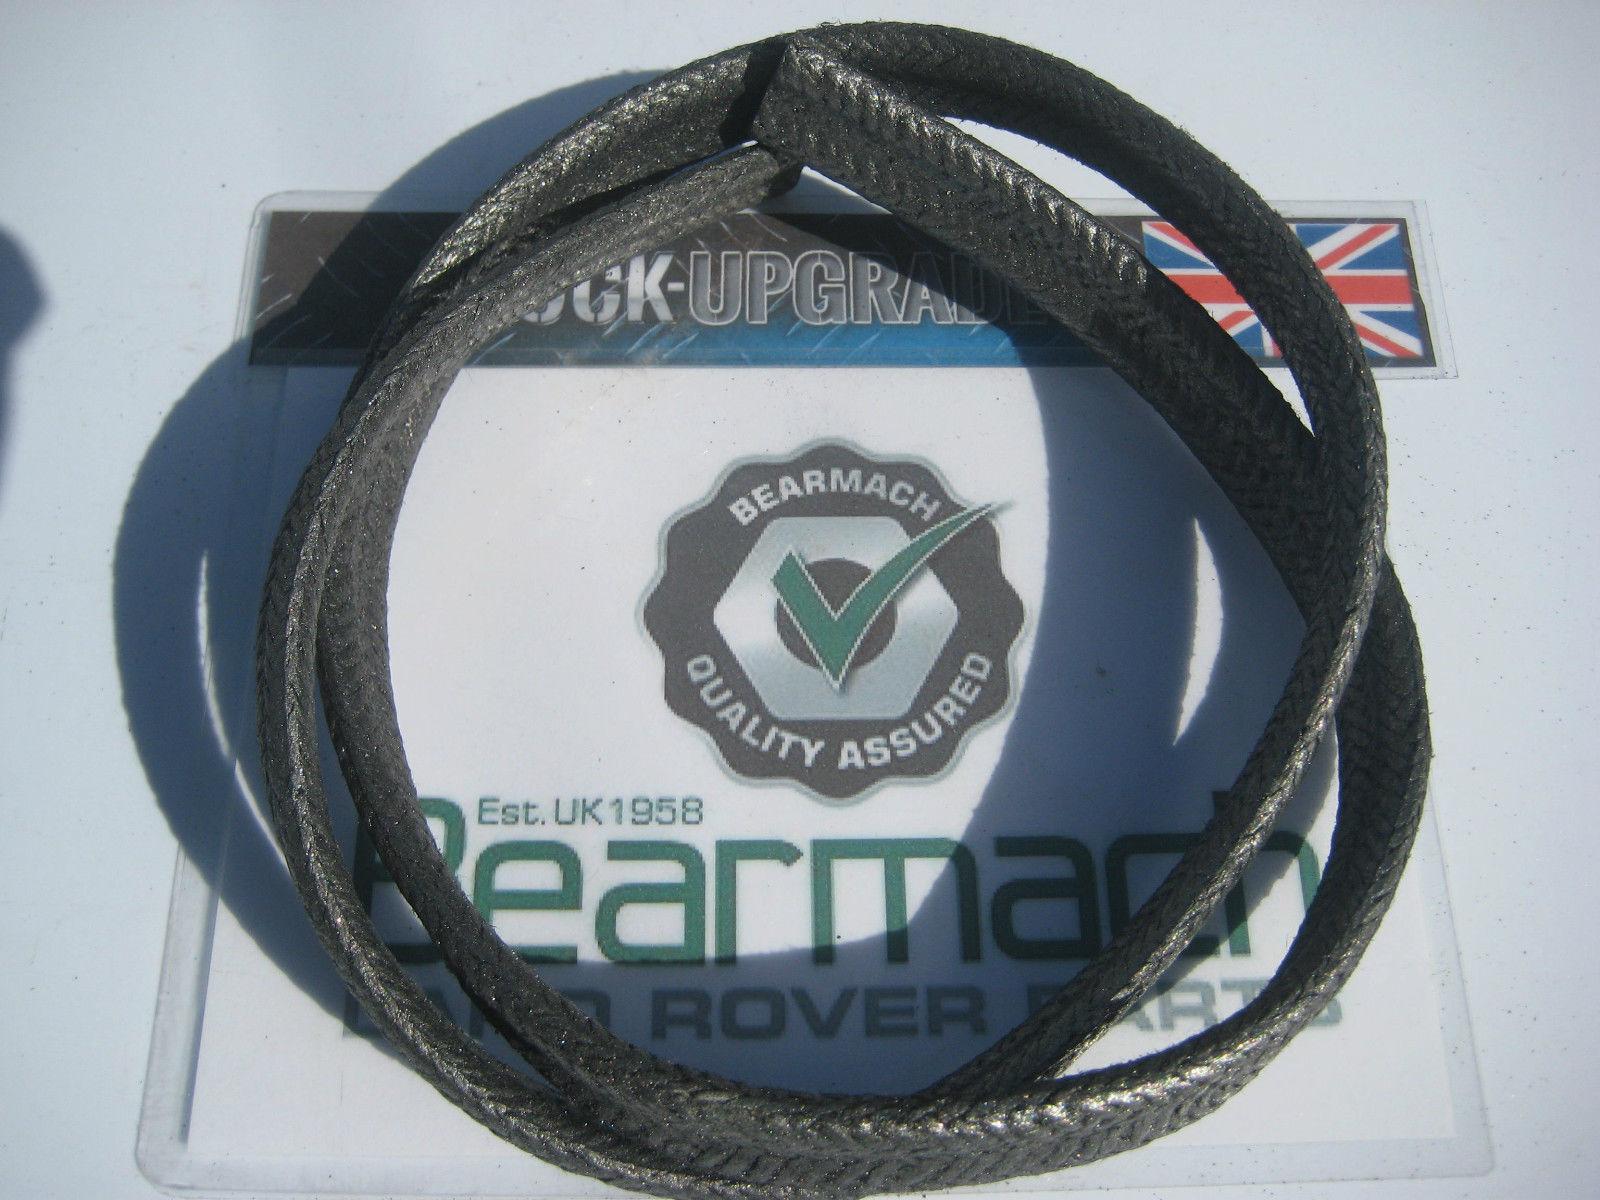 Quality Bearmach Part 300824 Land Rover Series 2 2a 3 Bonnet Rest Seal Strip